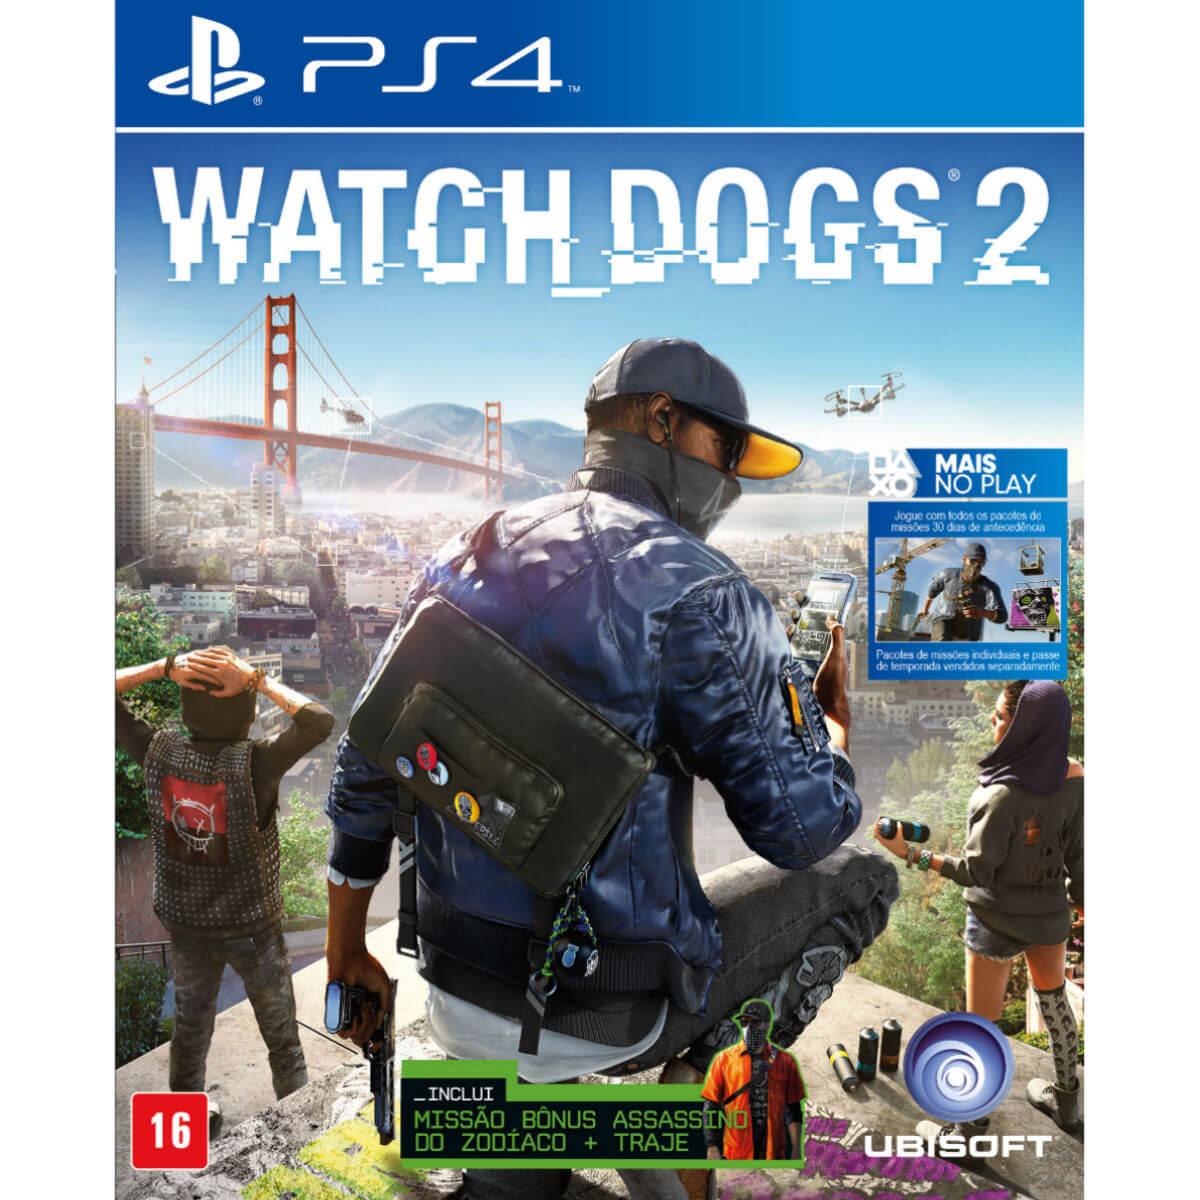 Watch Dogs 2 para Playstation 4 - Ubisoft